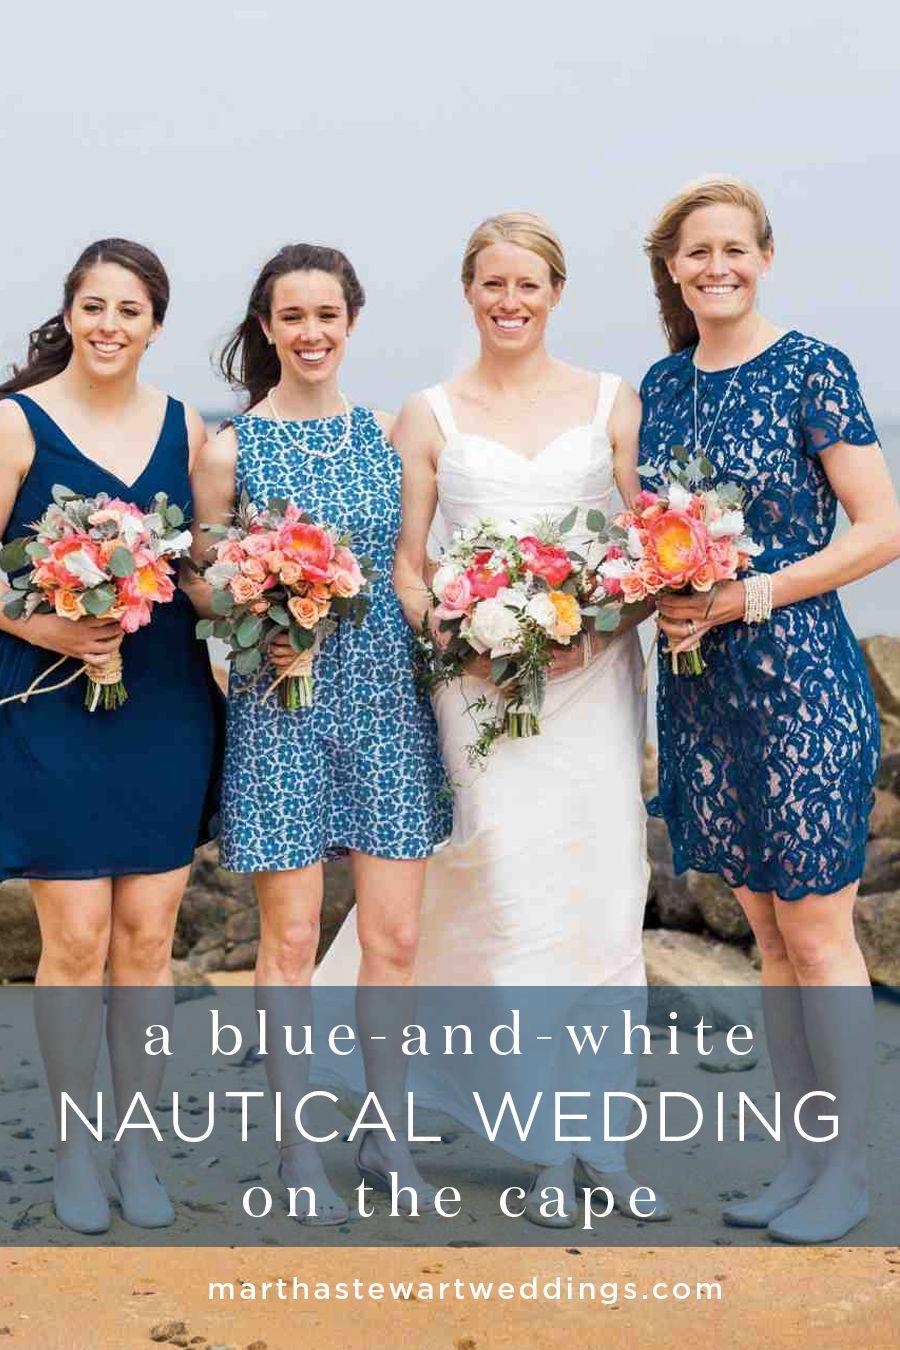 A Blue-and-White Nautical Wedding on the Cape | Martha Stewart Weddings